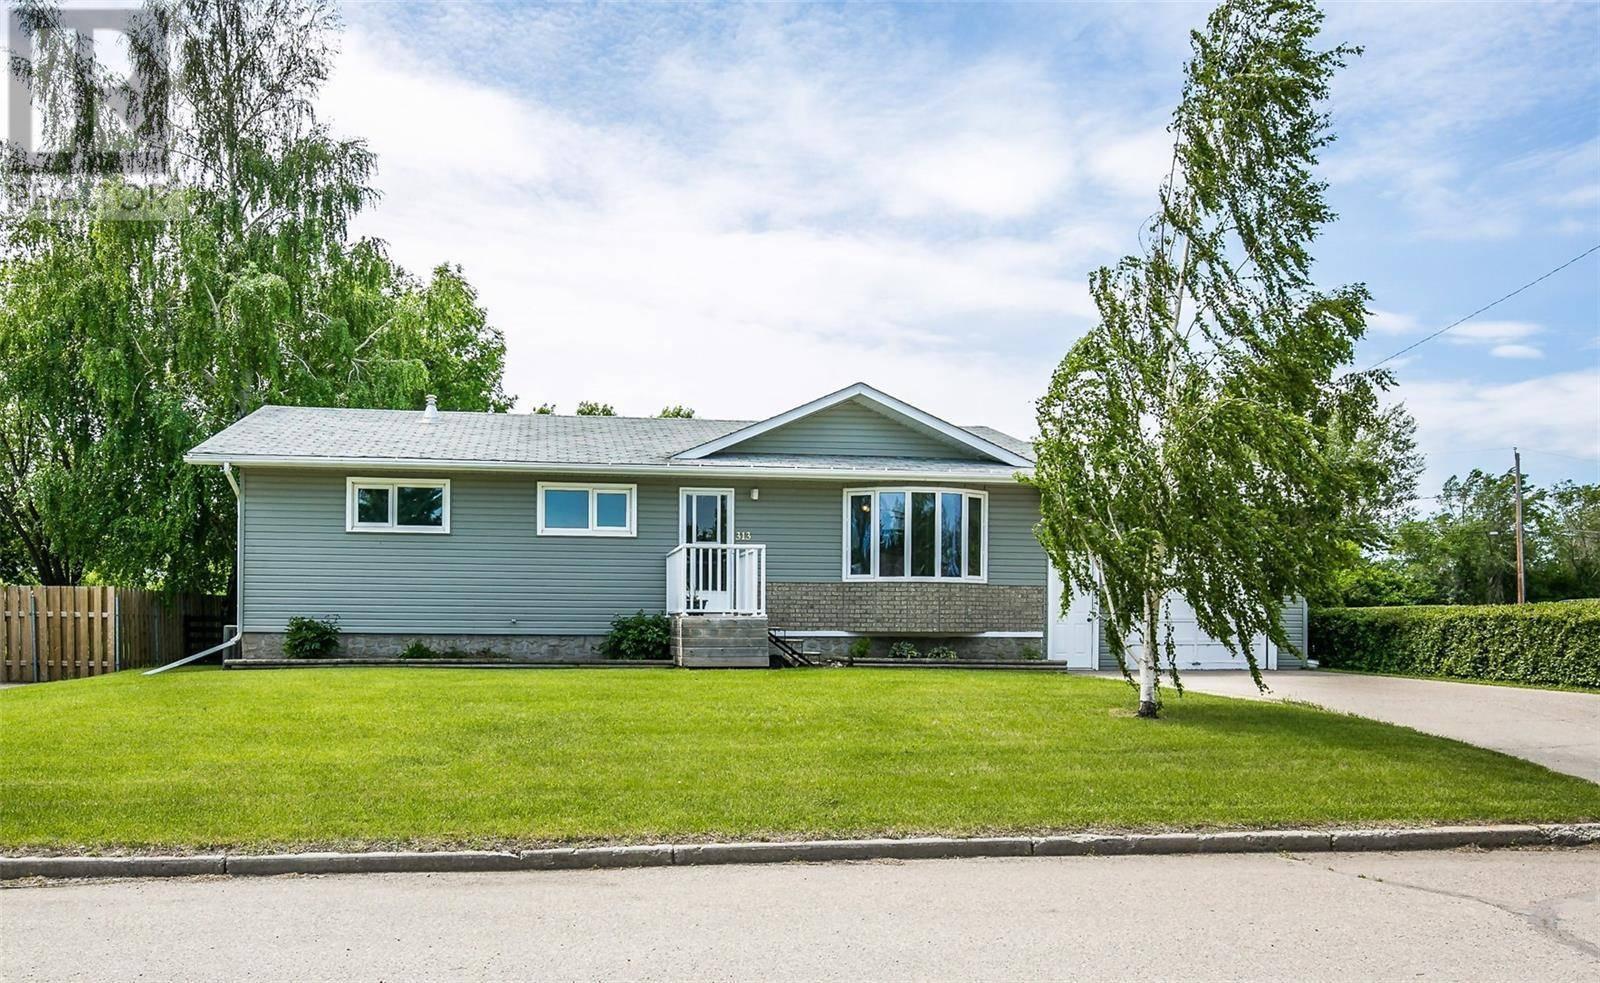 House for sale at 313 7th Ave W Watrous Saskatchewan - MLS: SK765954